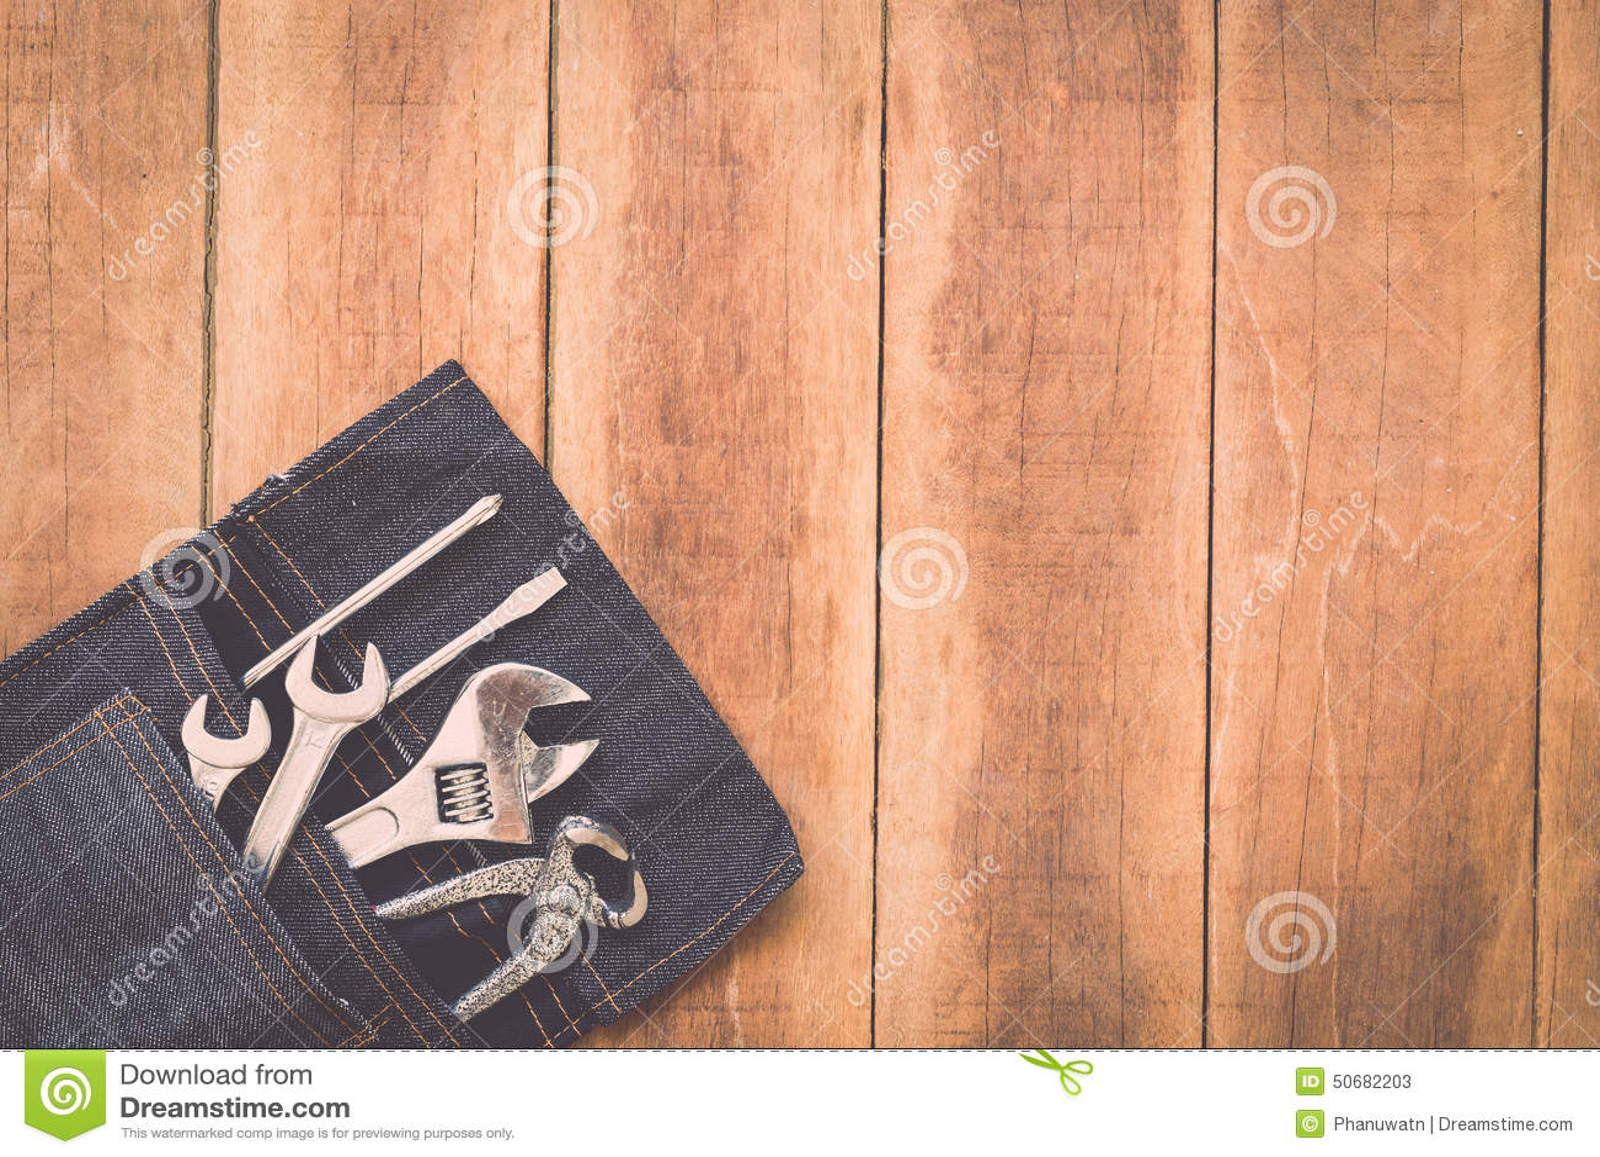 Download 在木头的被分类的工作工具 库存图片. 图片 包括有 整修, 硬件, brusher, 评定, 设备, 甲板 - 50682203